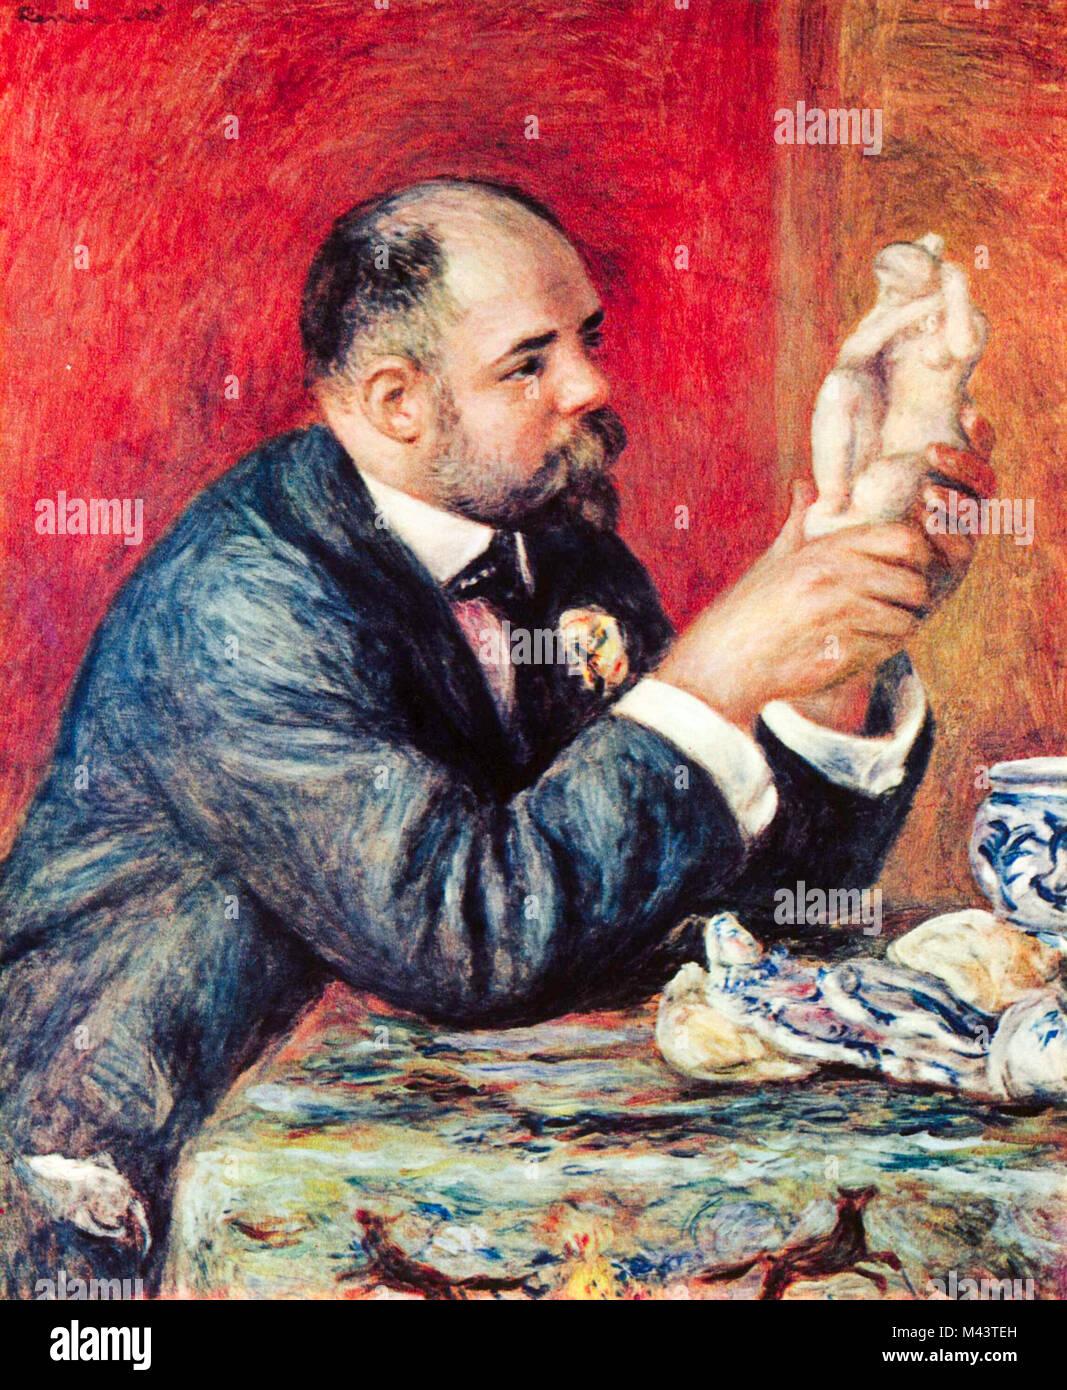 Portrait of Ambroise Vollard, 1908, Renoir - Stock Image